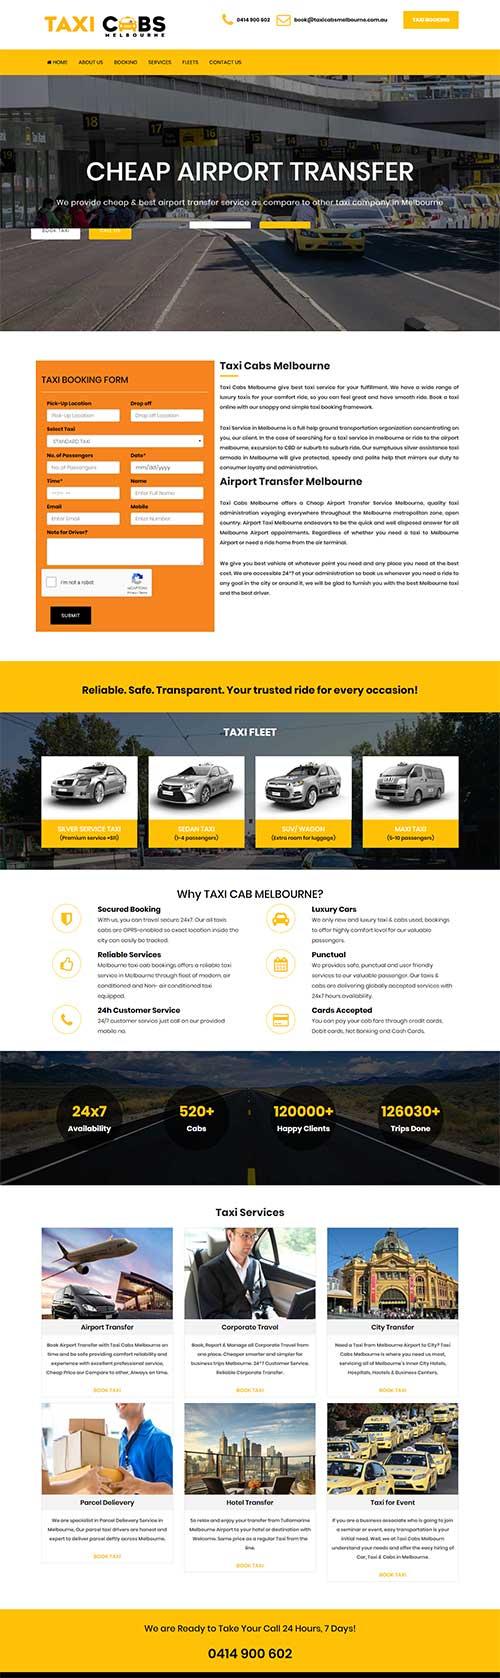 Taxi Cabs Melbourne